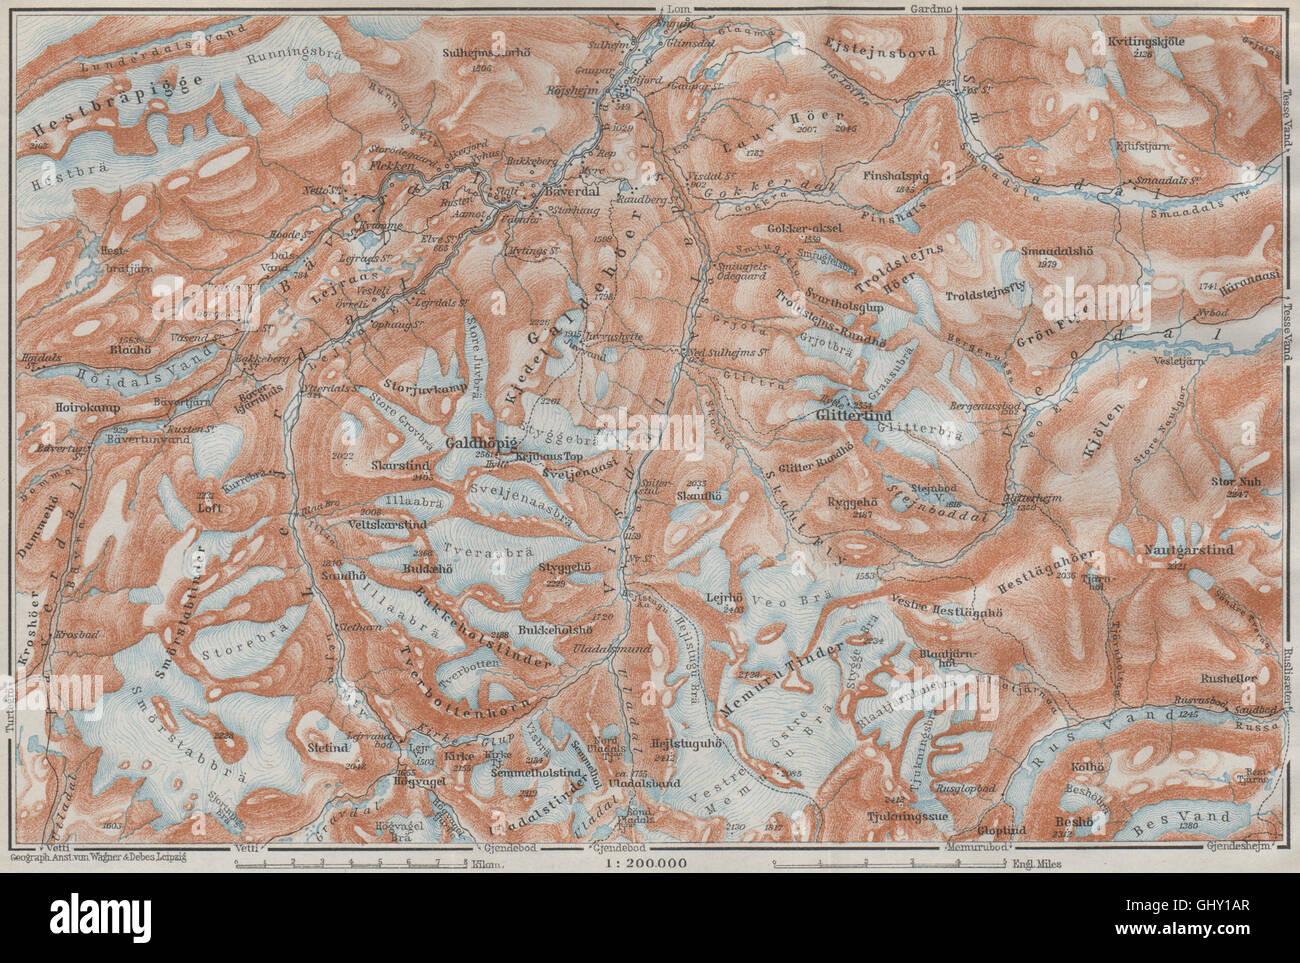 Galdhøpiggen and Glittertind mountains. Jotunheimen. Topo-map. Norway, 1909 - Stock Image